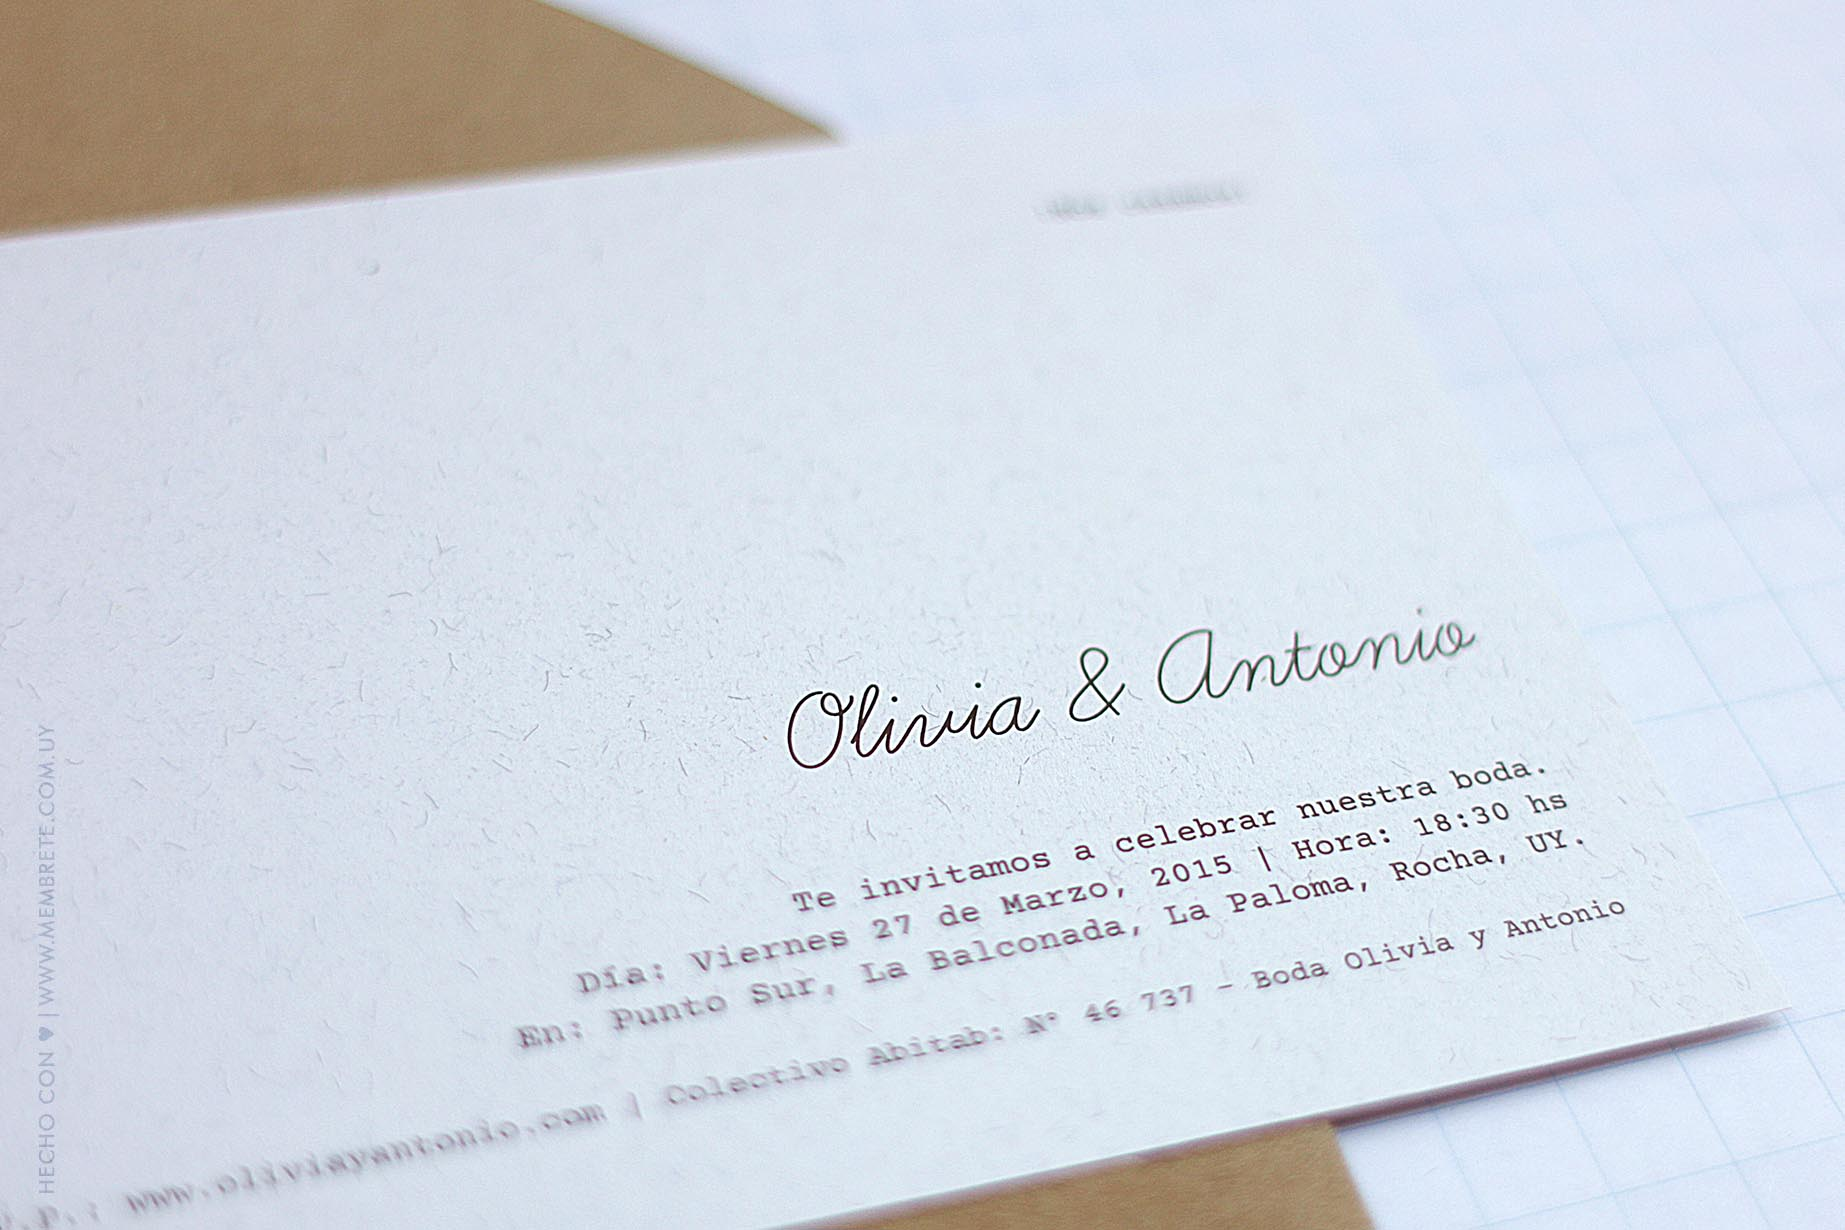 Olivia & Antonio ♥ Membrete   Invitaciones en papel   www.membrete.com.uy